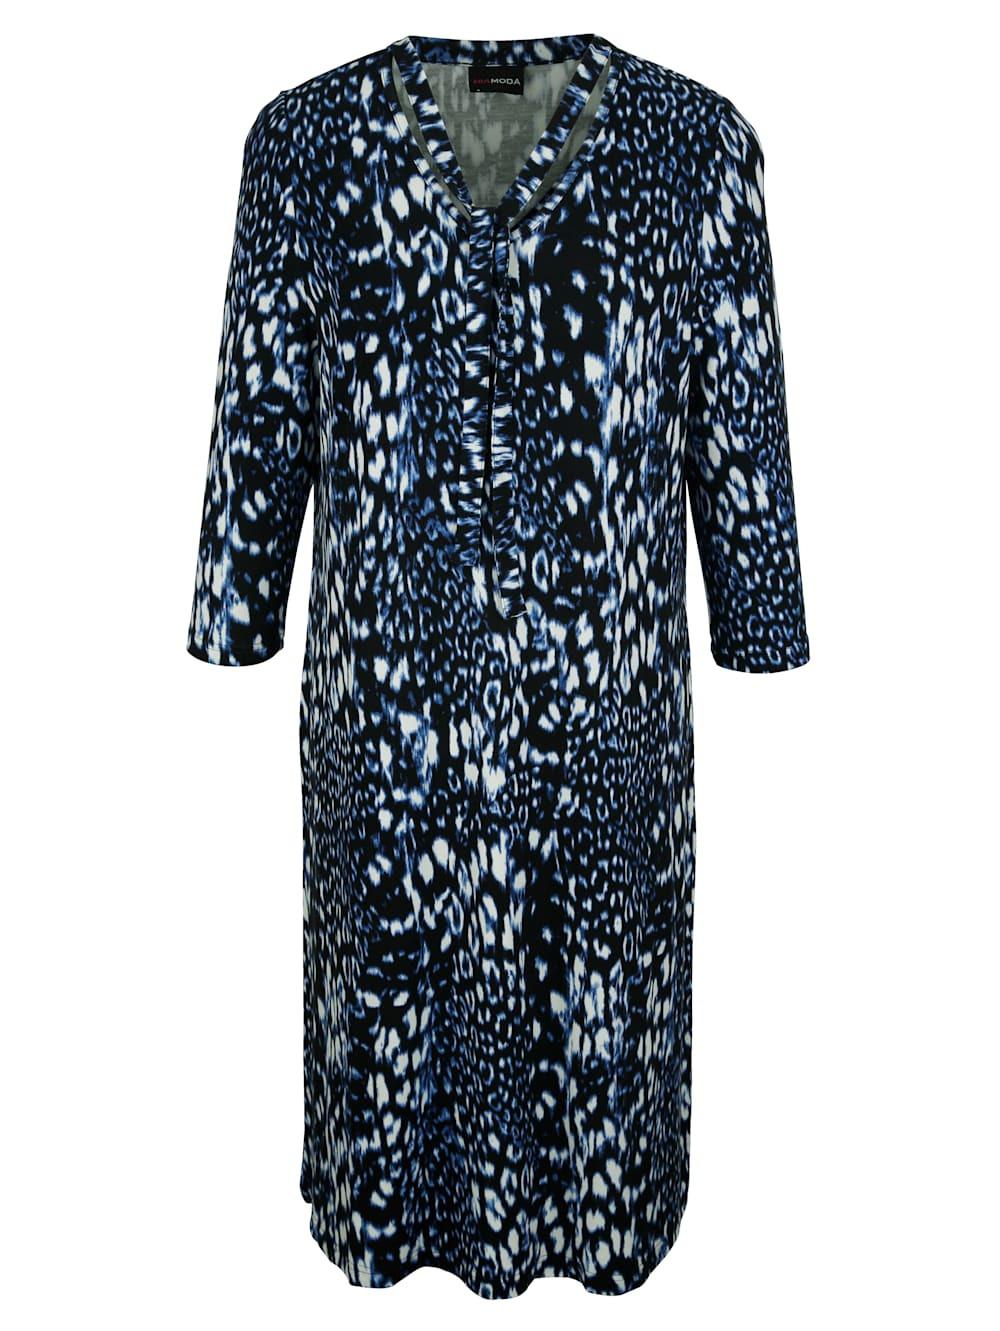 Miamoda Kleid Mit Dekobändern Am Ausschnitt  Mia Moda